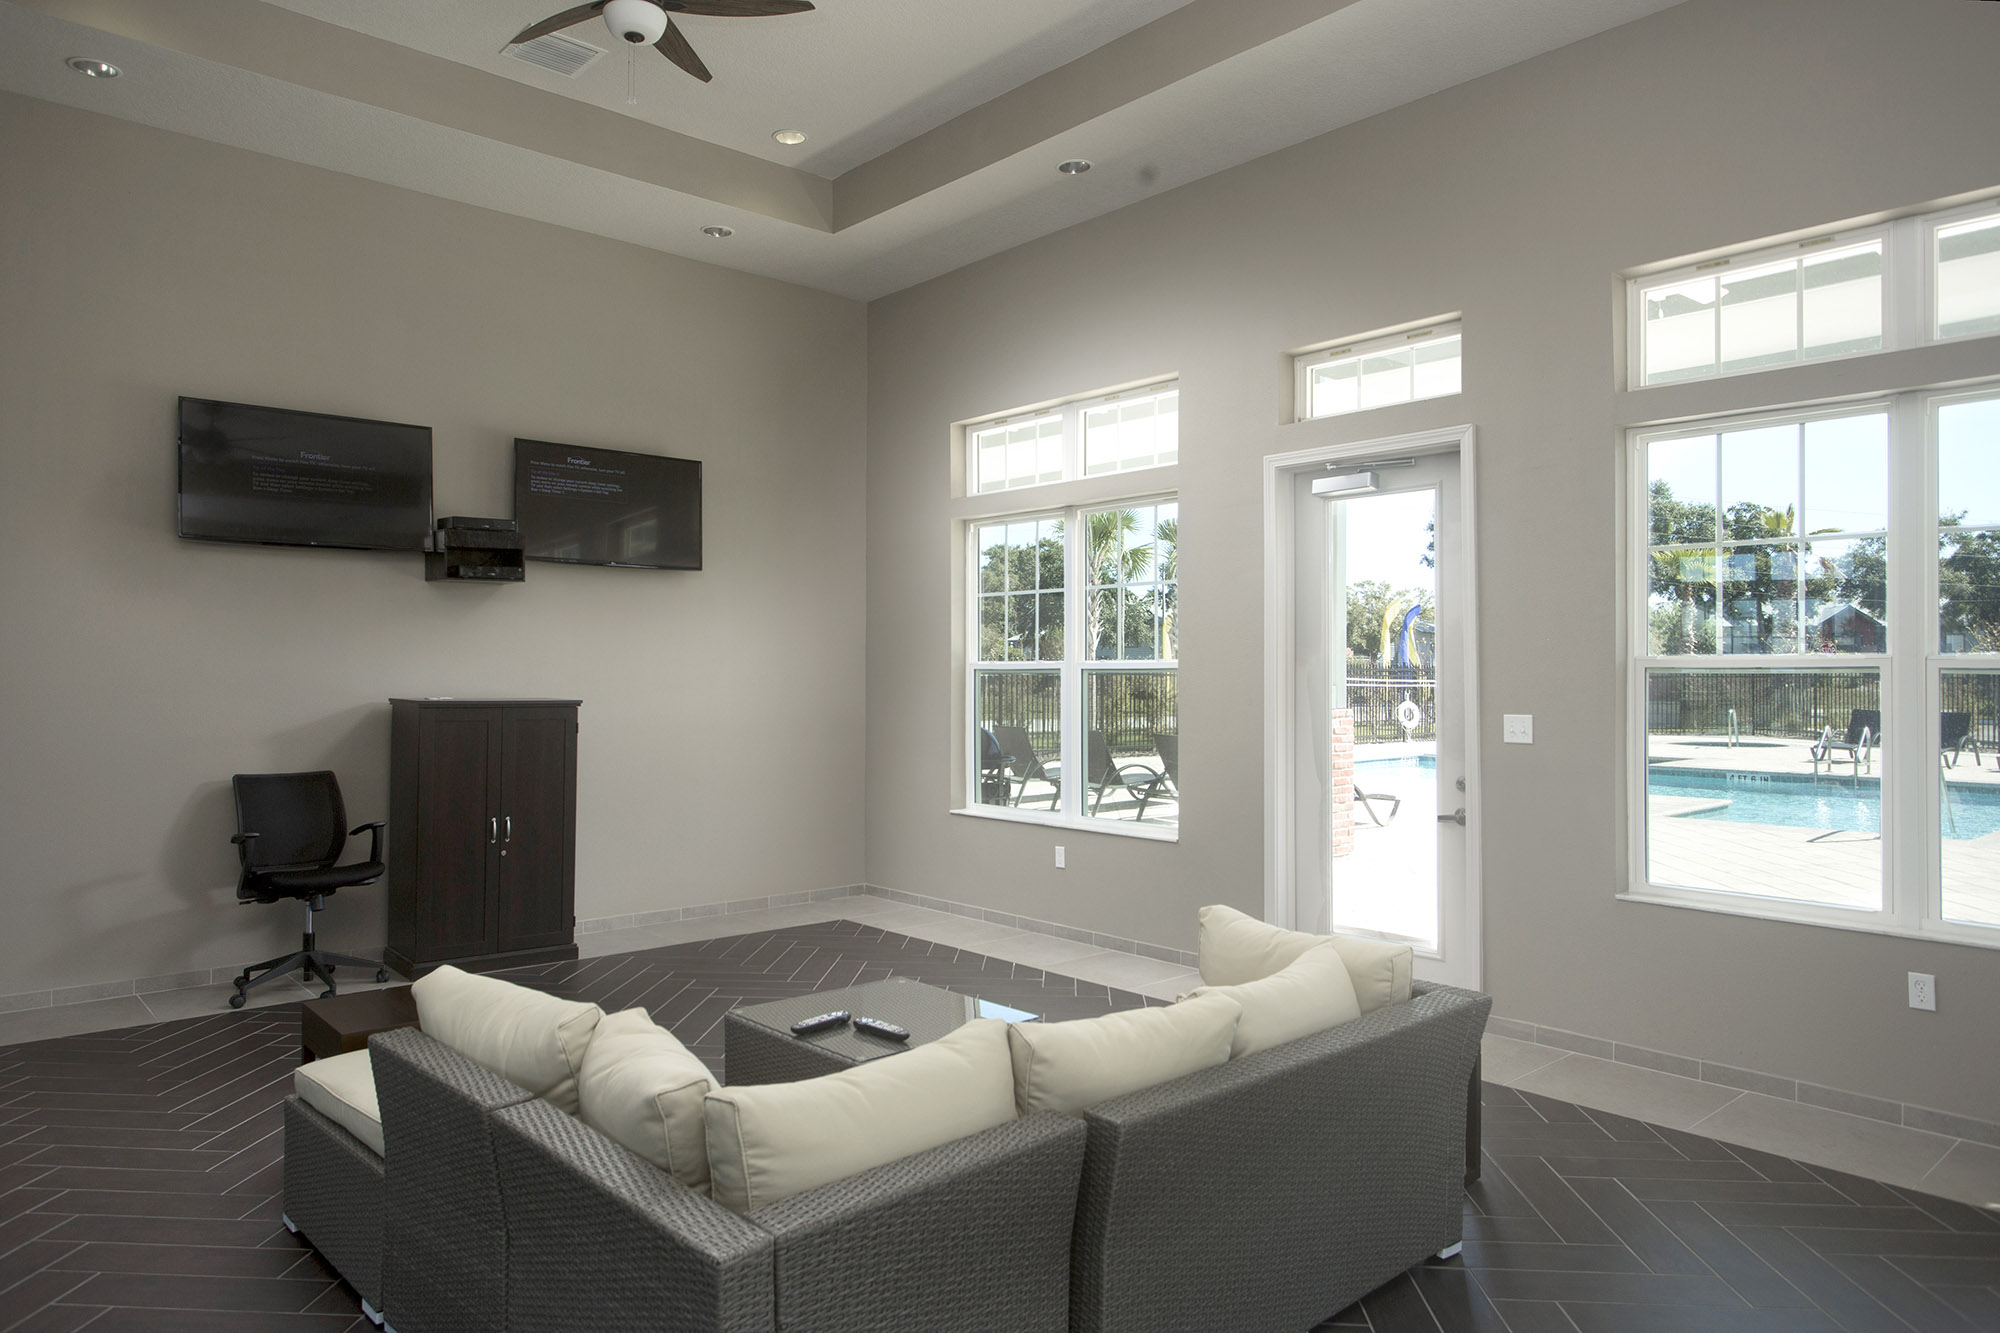 CharlestonEdge-Rental-Apartment-Brandon-Tampa-Florida-Pool-Bedrooms-Pool-1.jpg